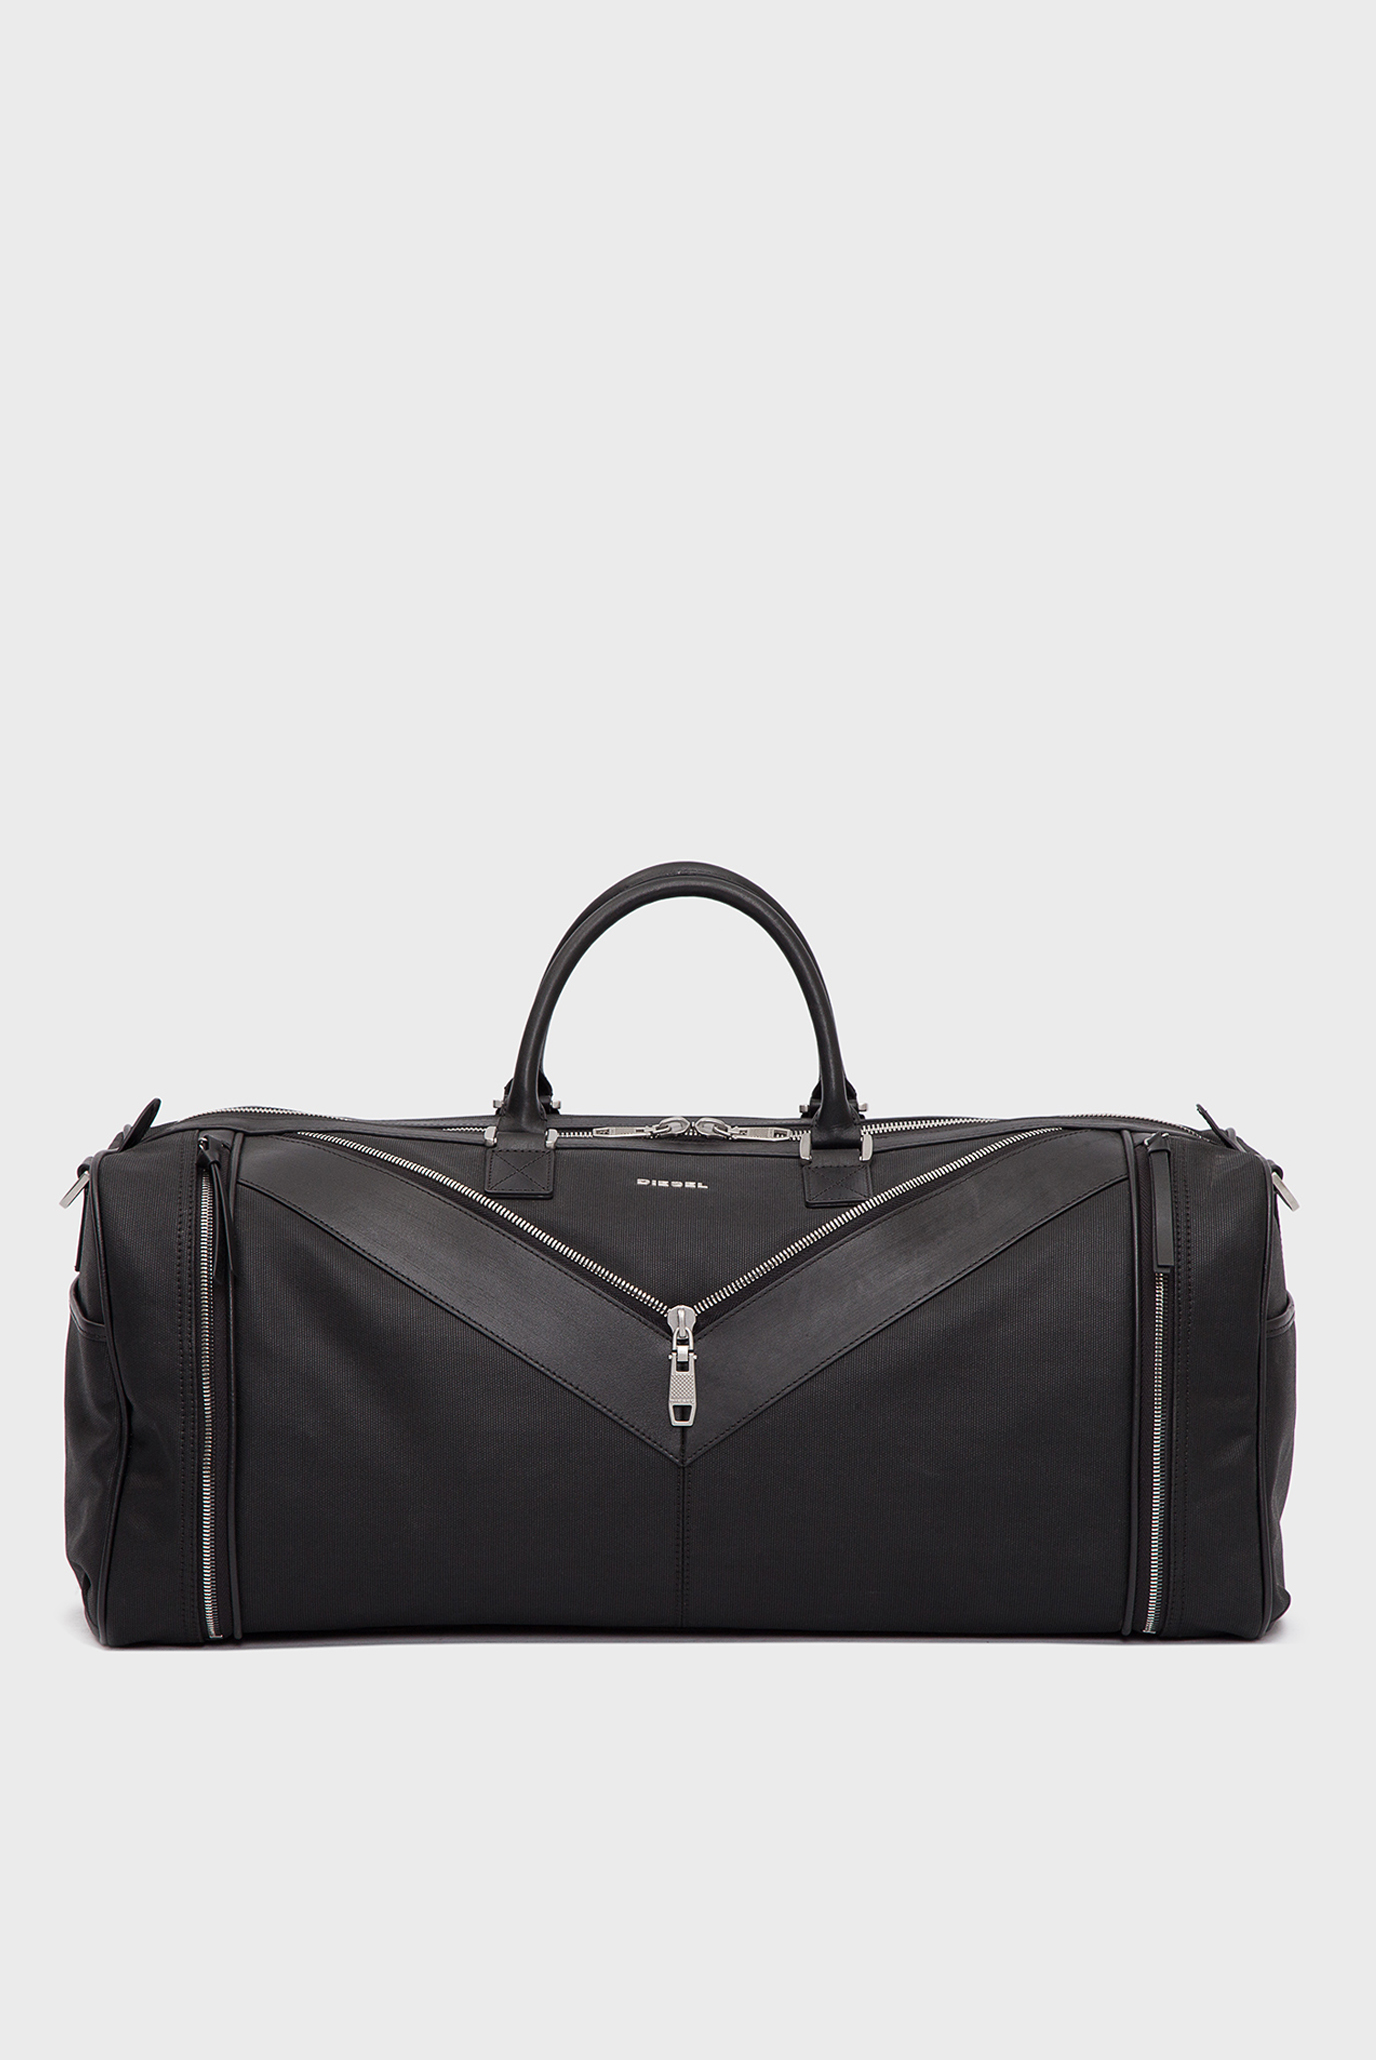 429ecc7070e1 Купить Мужская черная дорожная сумка Diesel Diesel X04216 P0097 ...